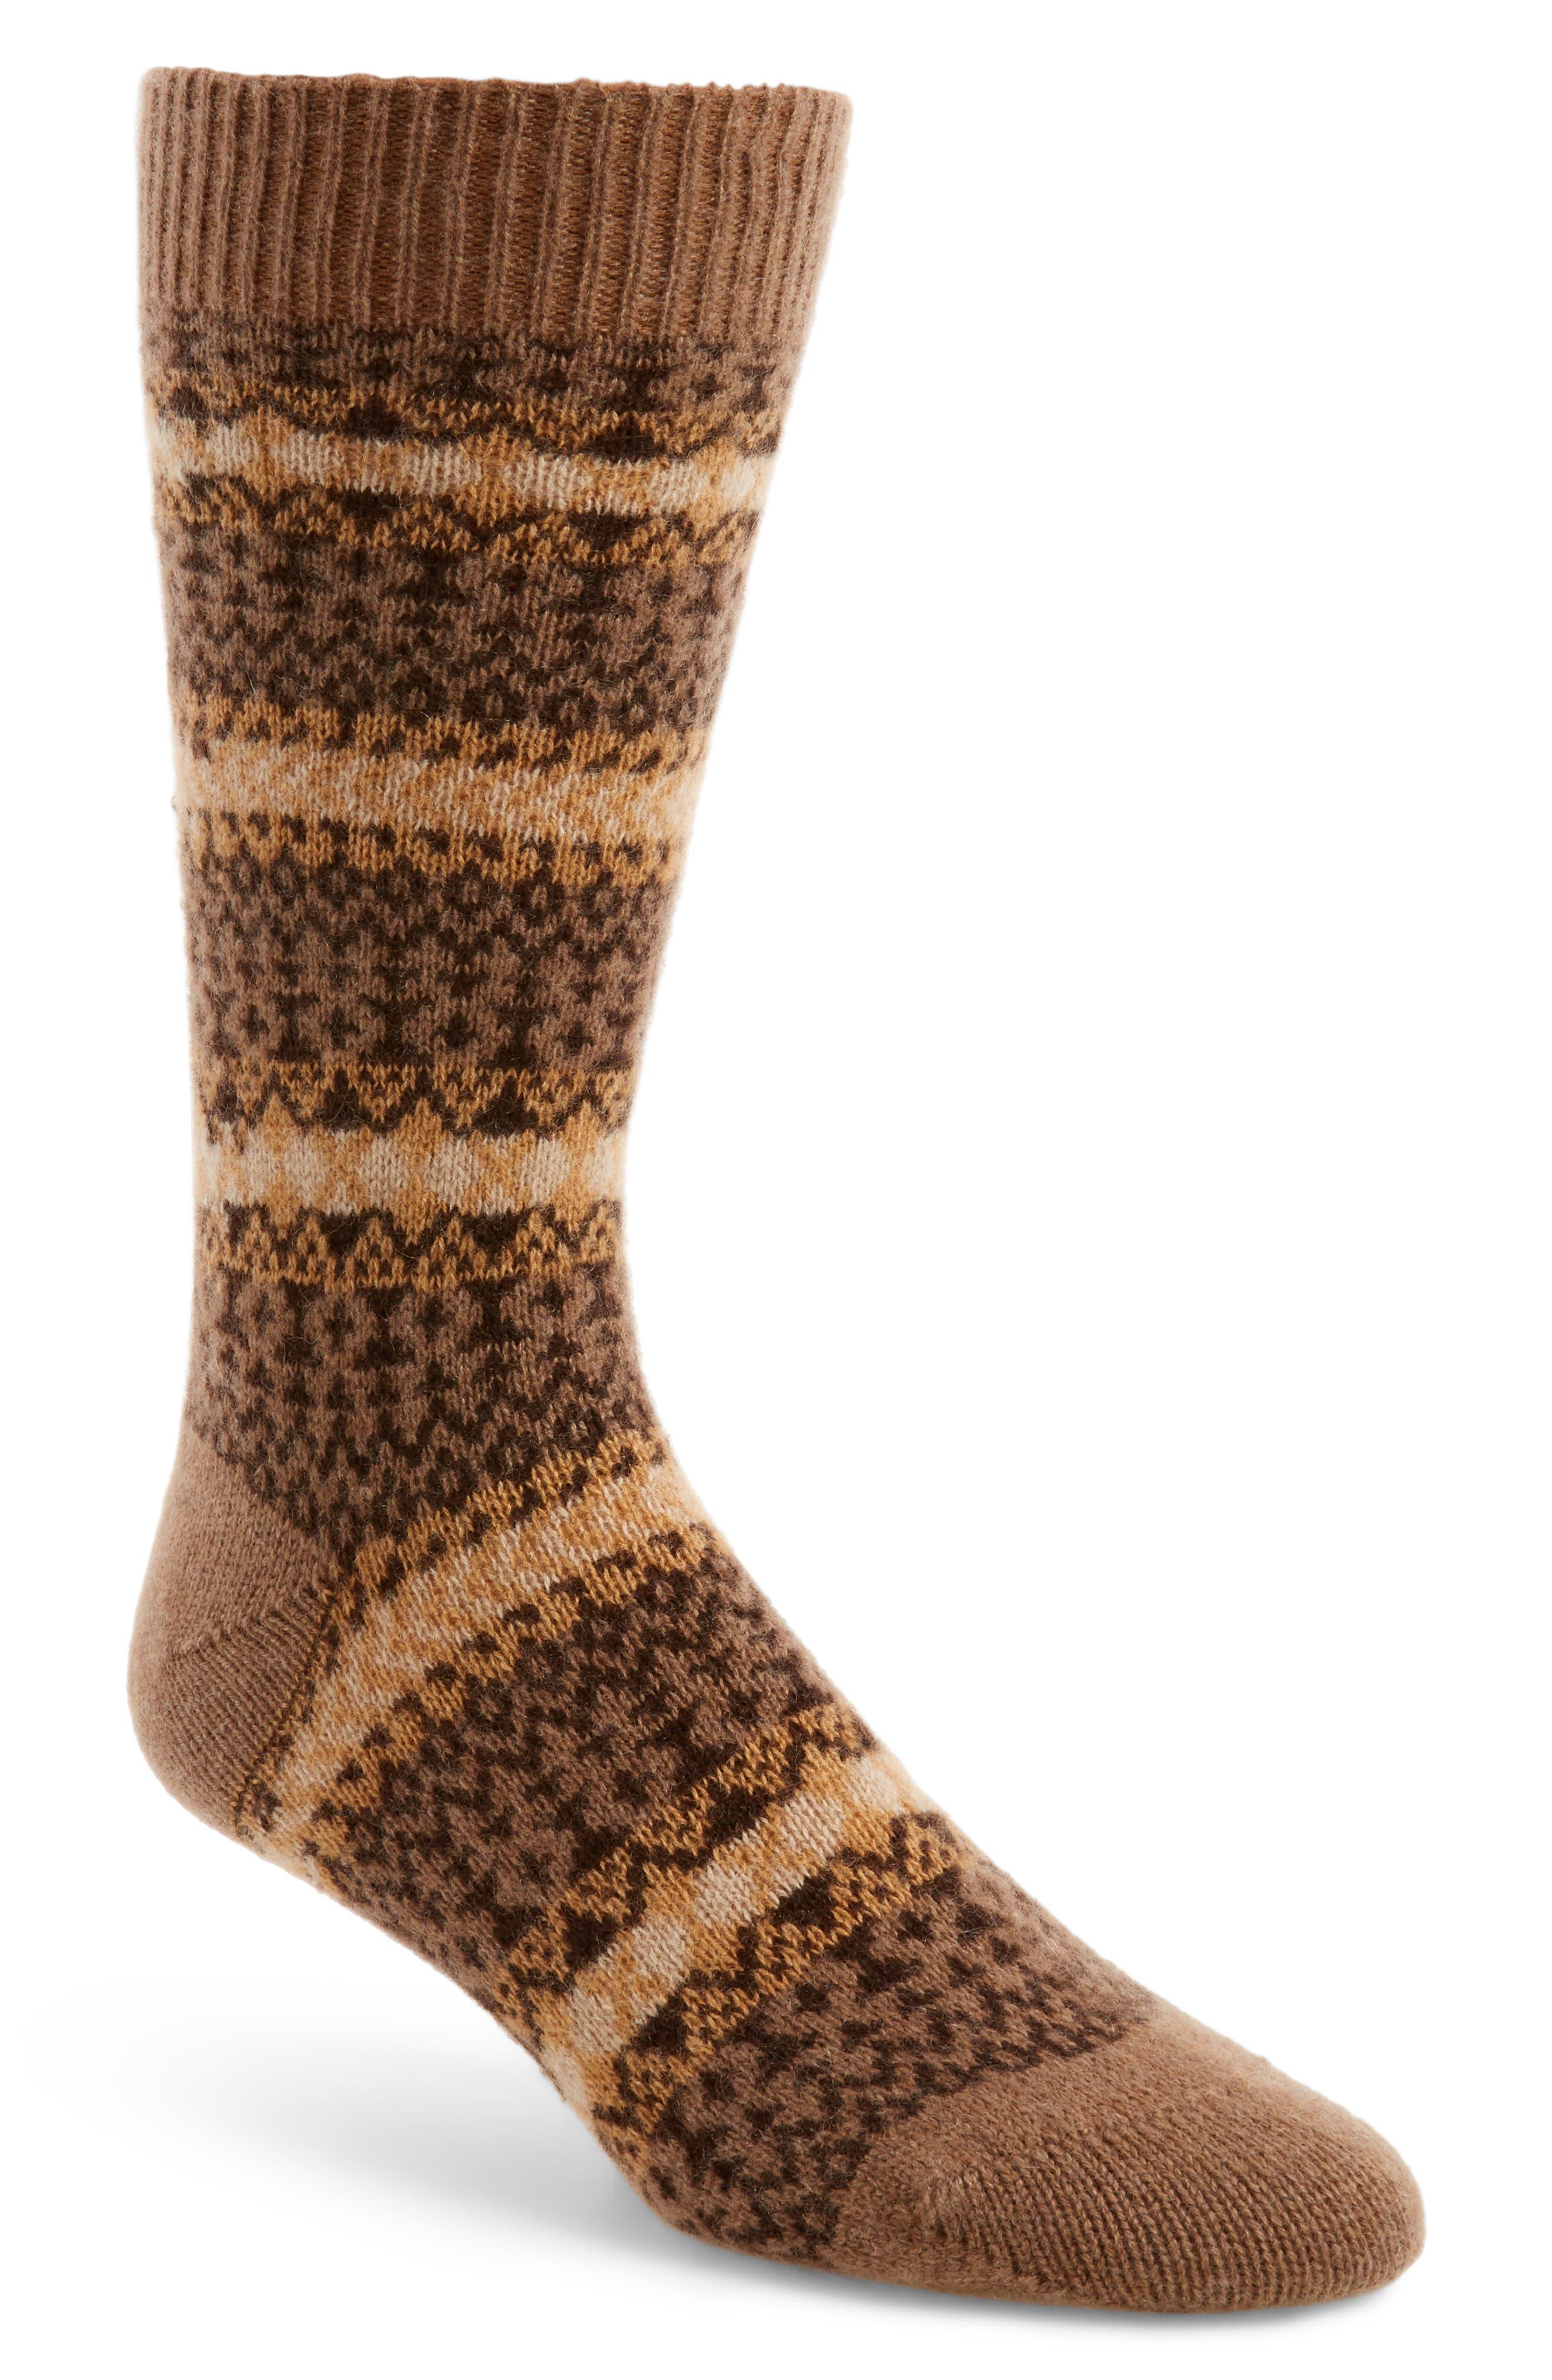 Pantherella Fair Isle Cashmere Socks